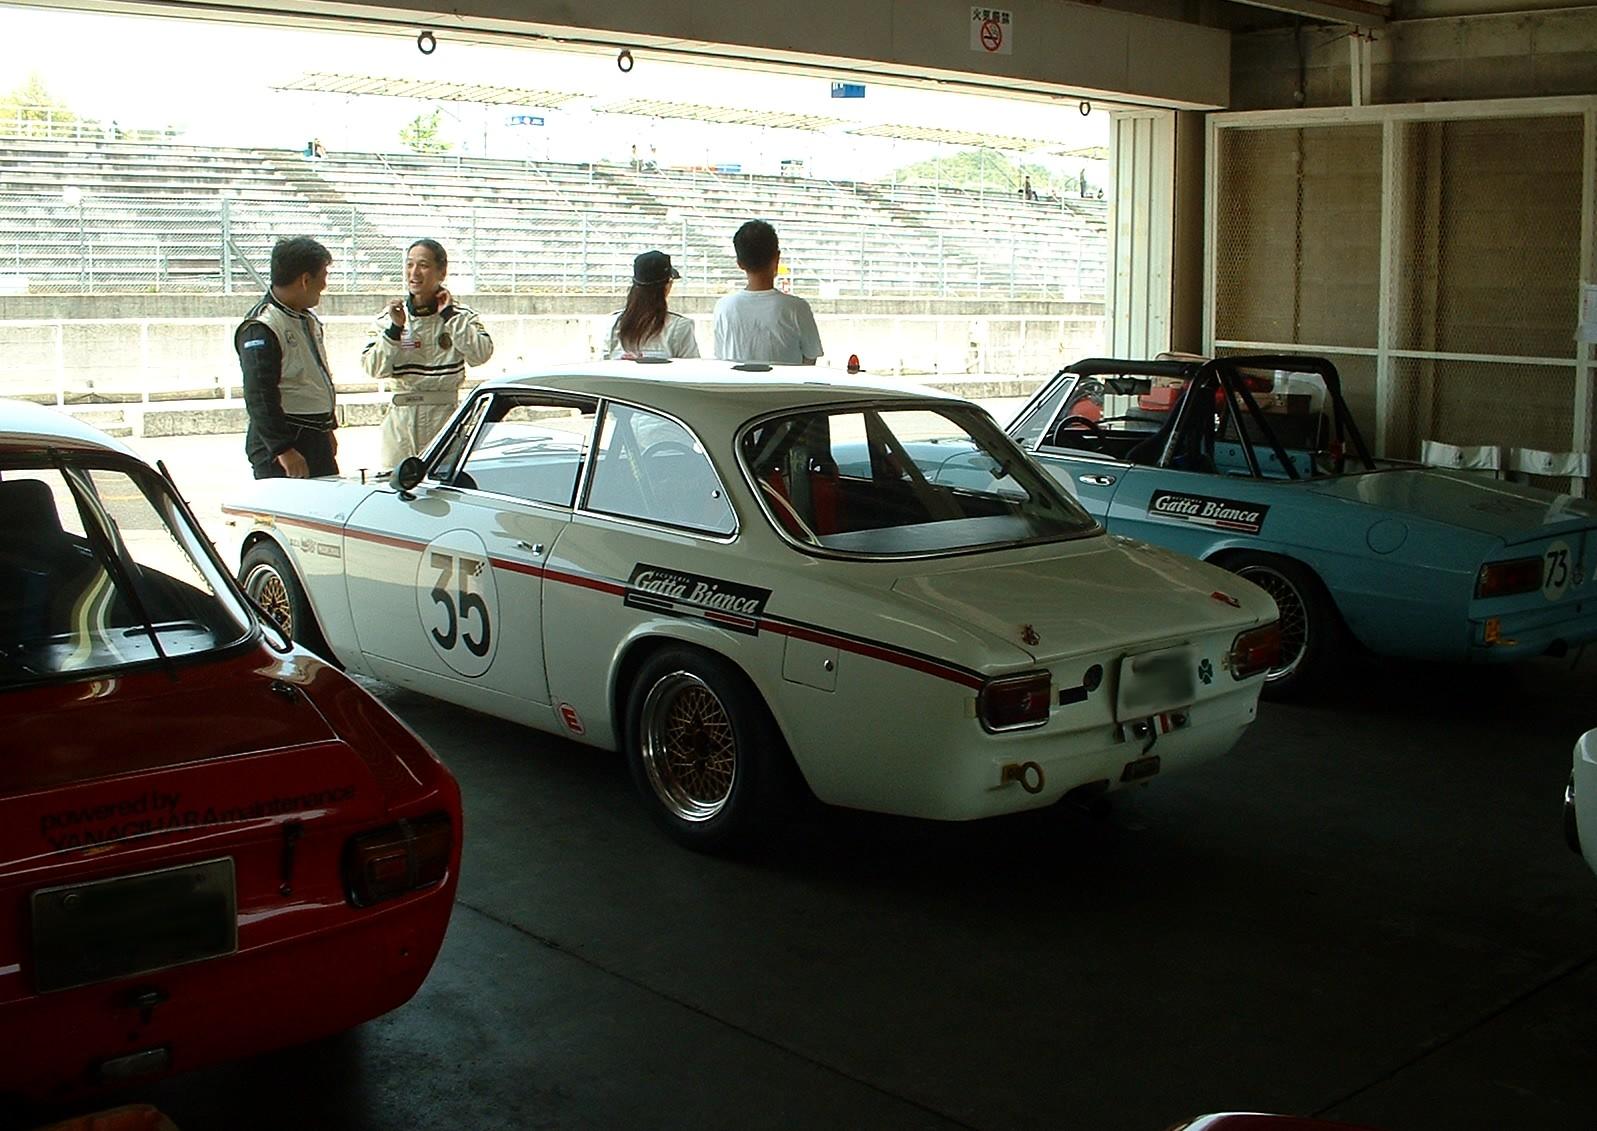 Gattabianca352008